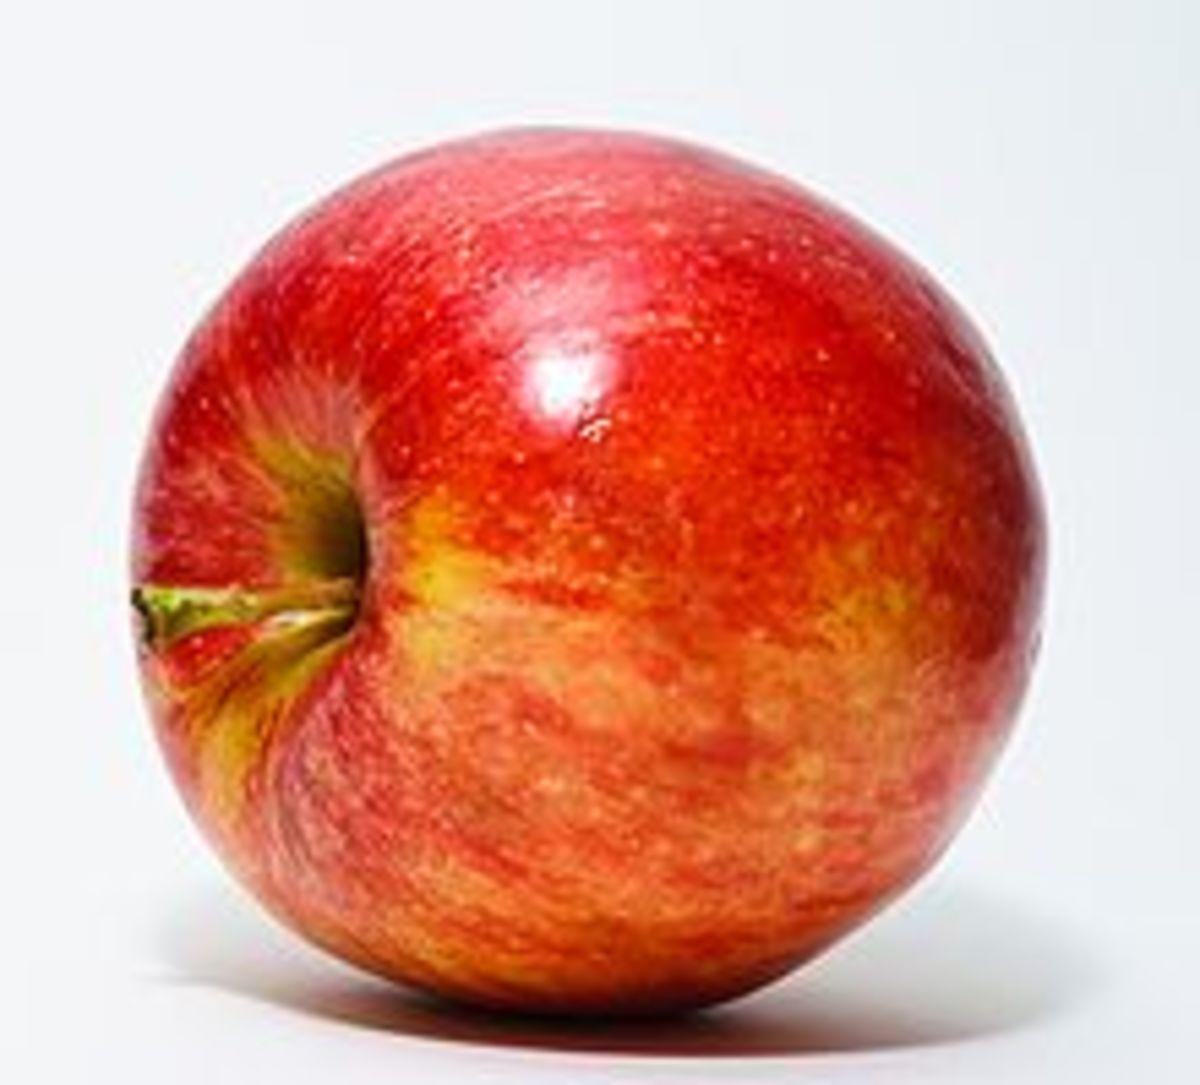 Best Winter Fruit - the apple!